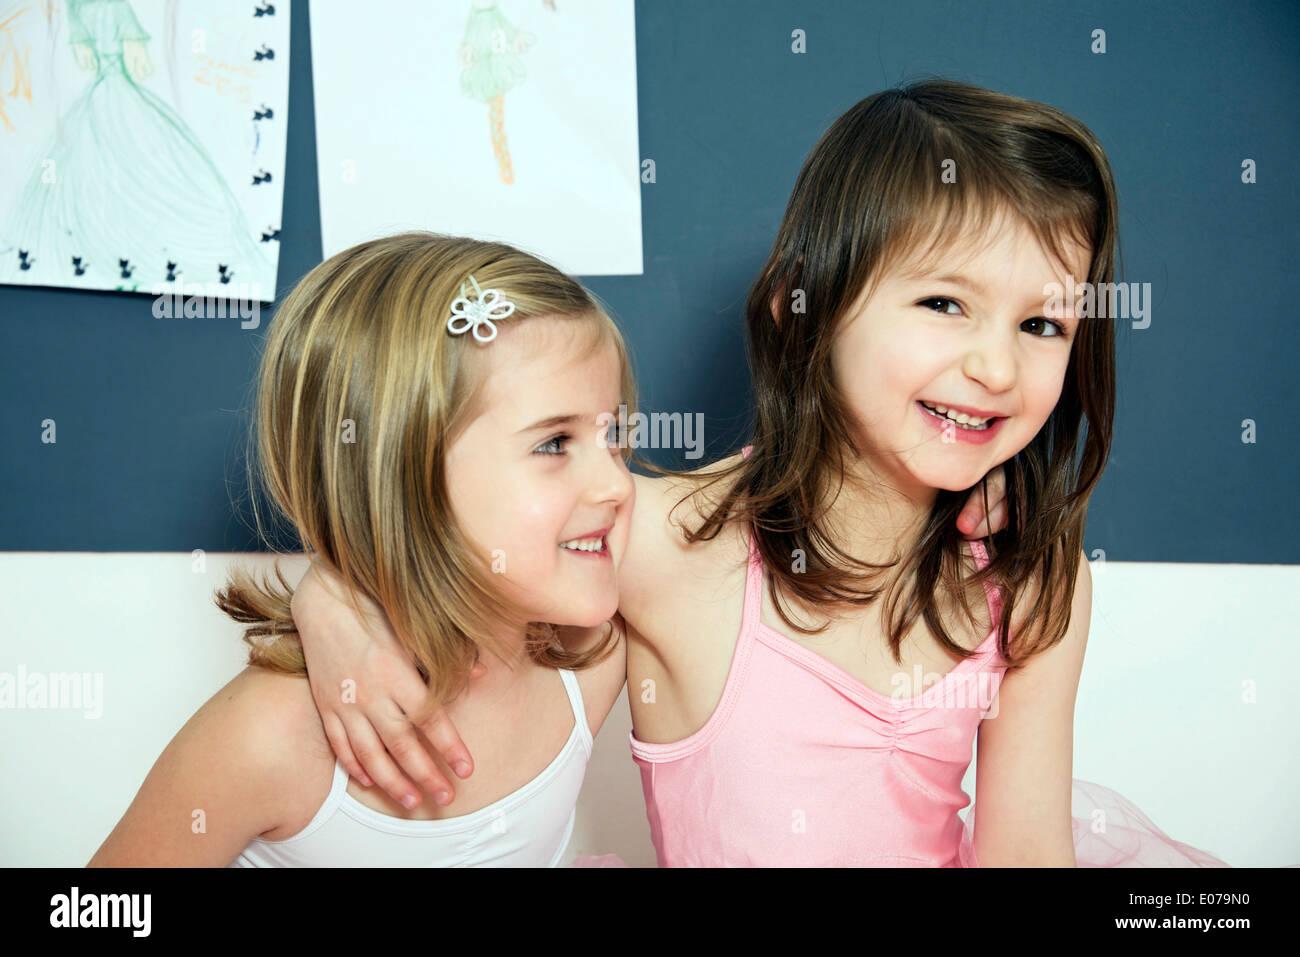 Two little girls as ballet dancers, portrait - Stock Image